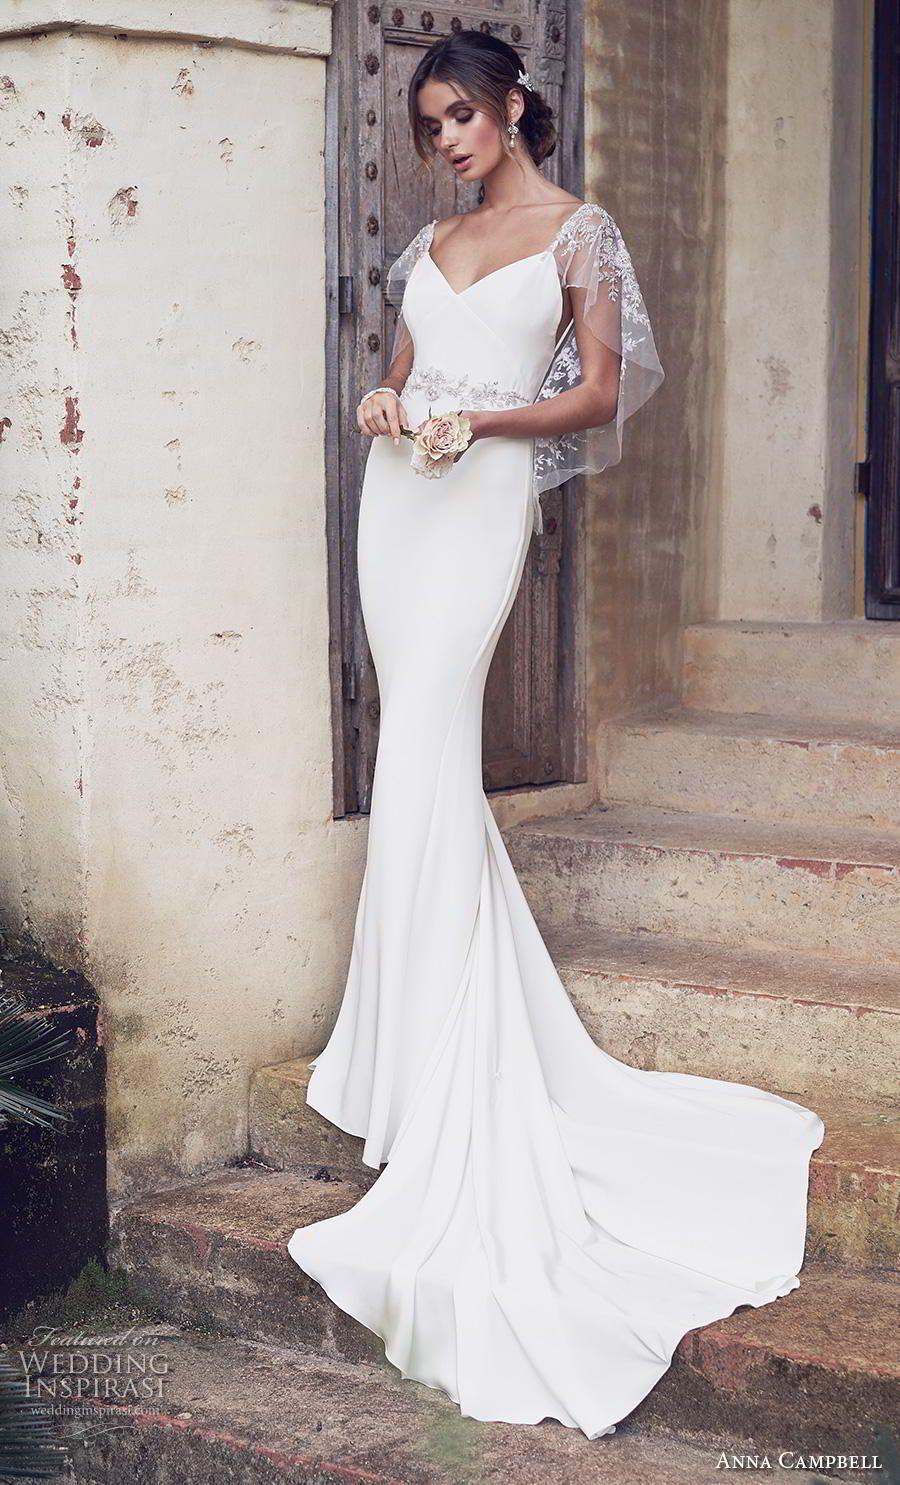 20 Simple Rustic Wedding Dresses Belle The Magazine Wedding Dresses Simple Wedding Dresses Dream Wedding Dresses [ 1519 x 615 Pixel ]